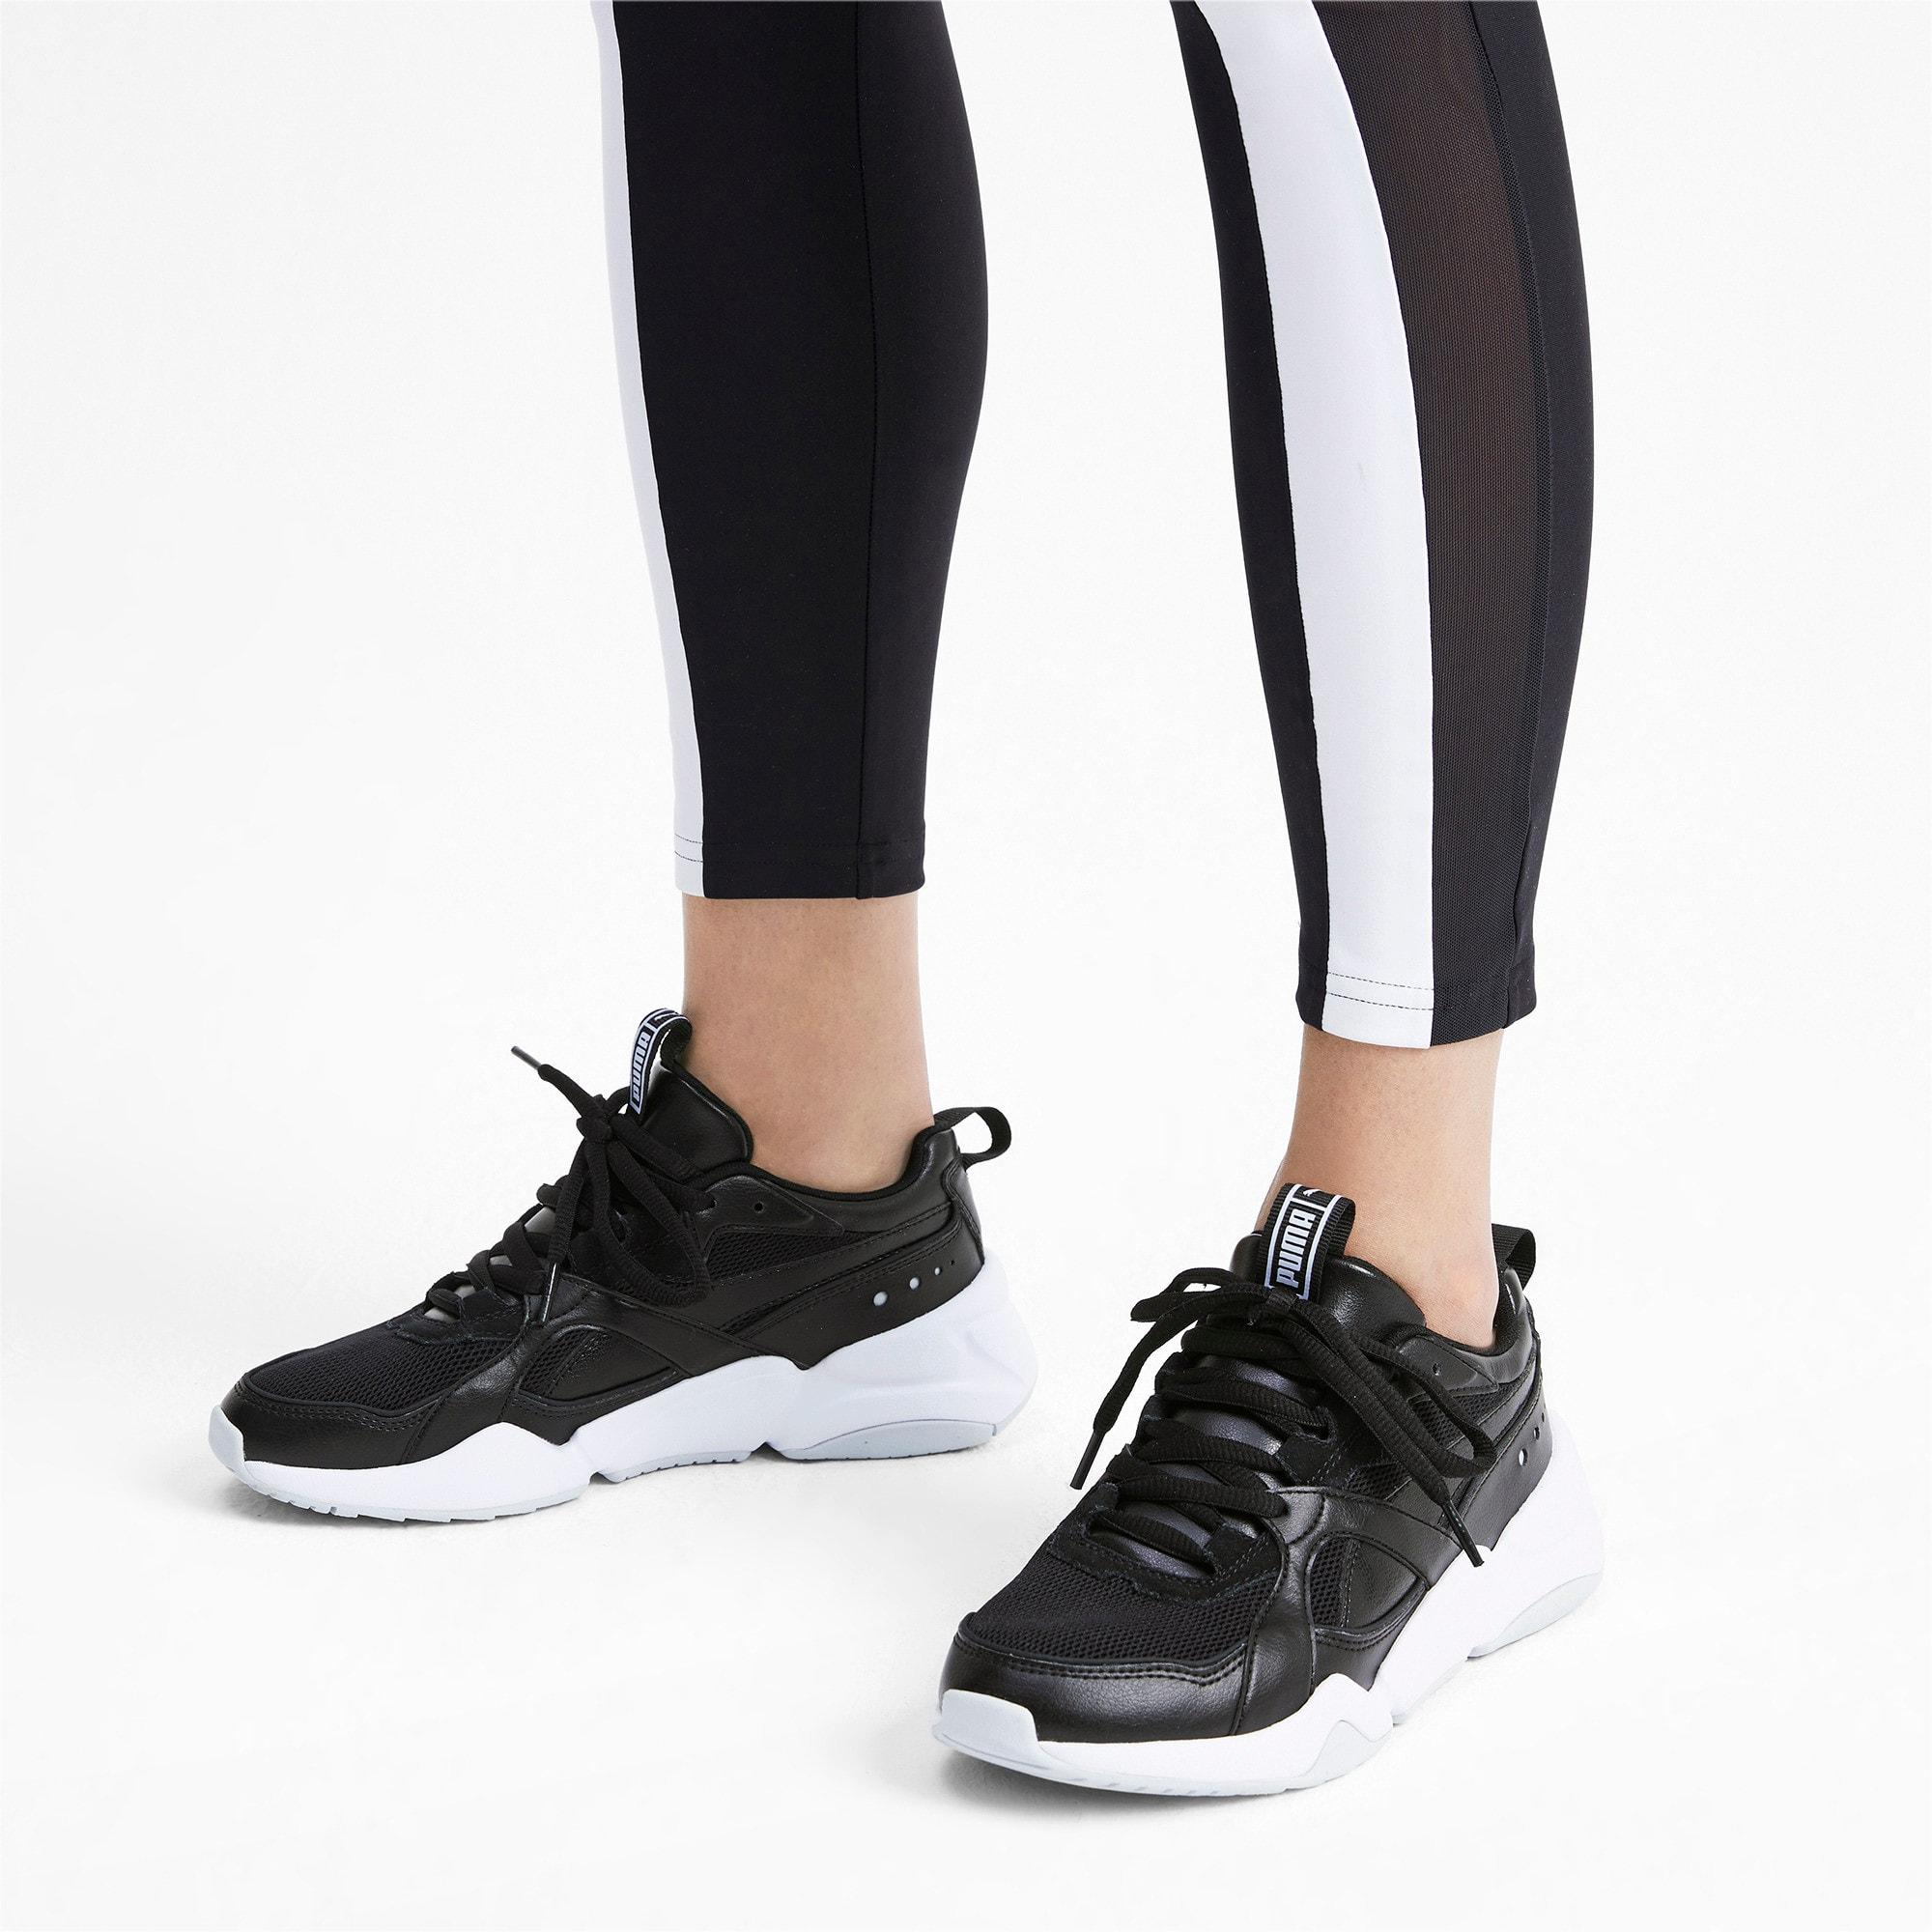 Thumbnail 2 of Nova 2 Women's Sneakers, Puma Black-Heather, medium